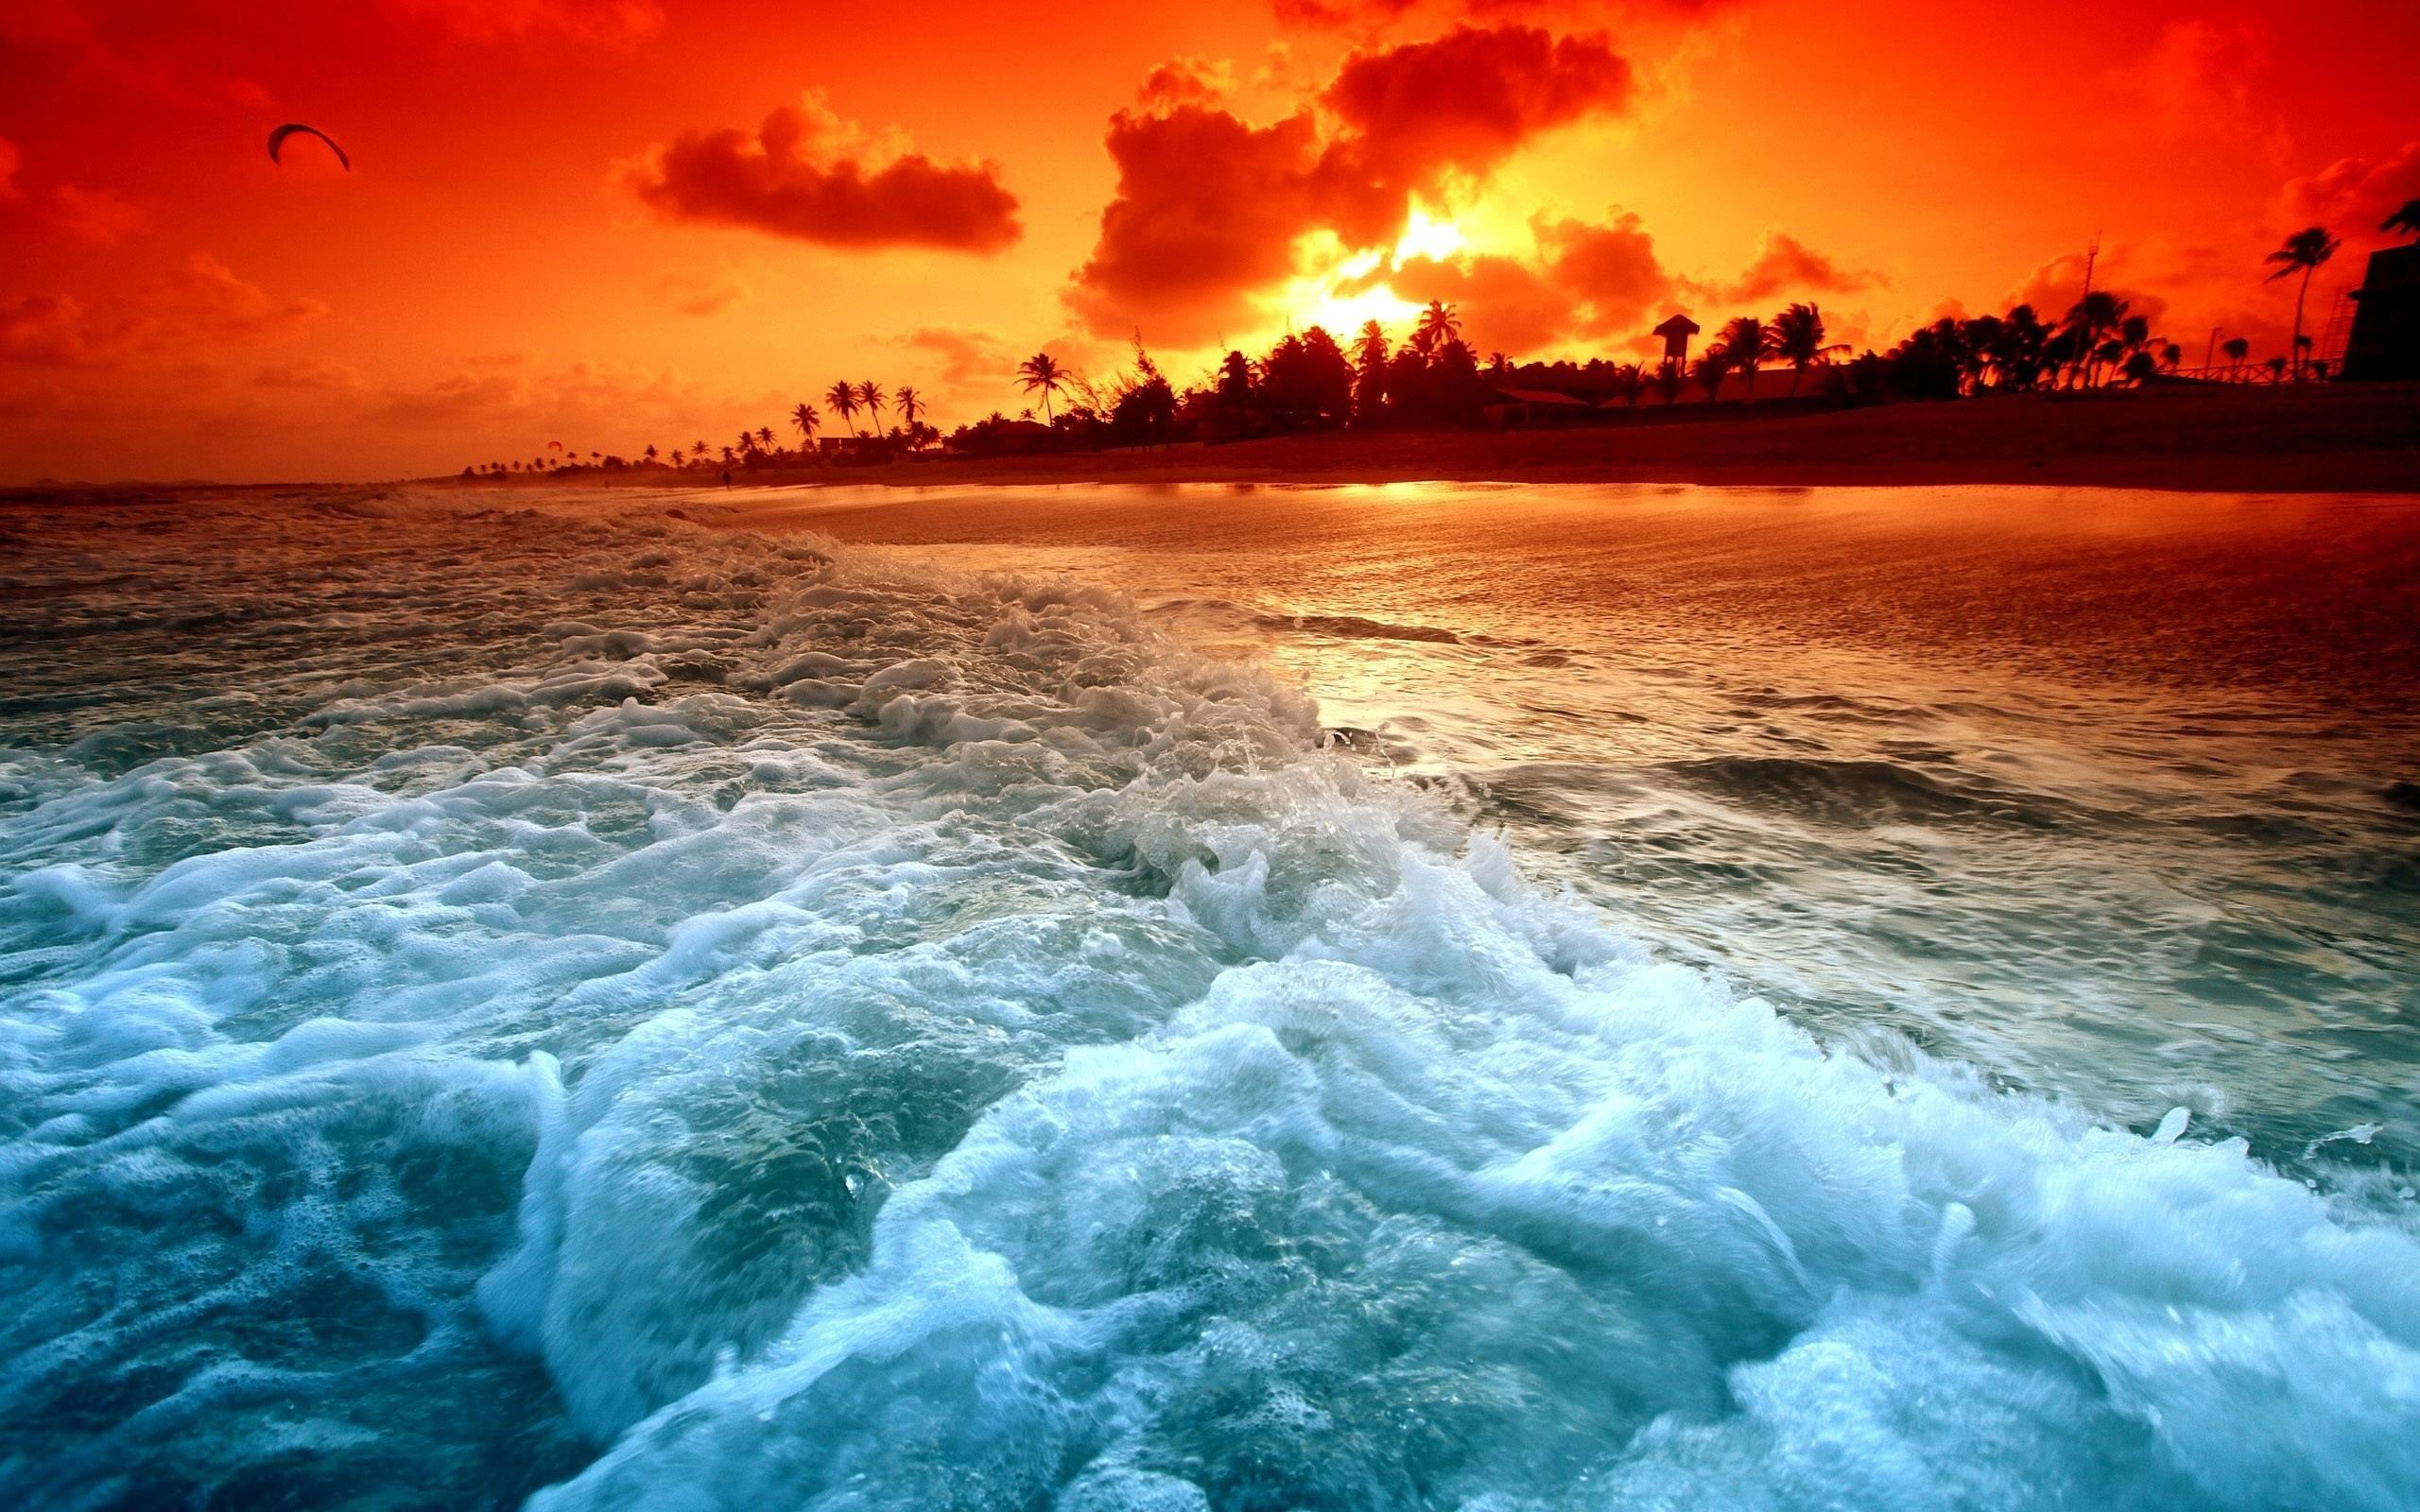 Ocean Sunset Wallpaper   HD Wallpapers Image